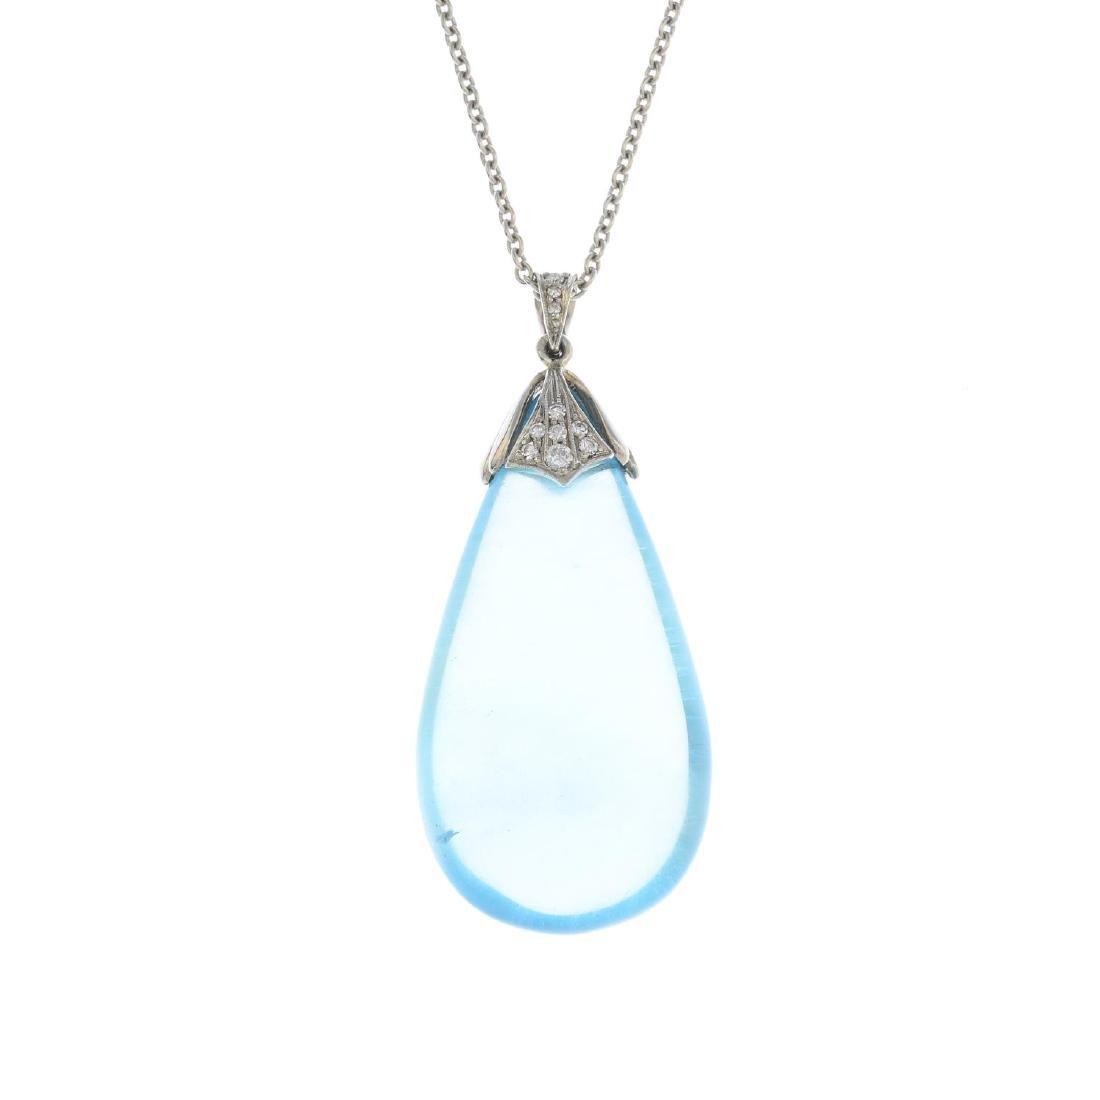 An aquamarine and diamond pendant. Designed as a